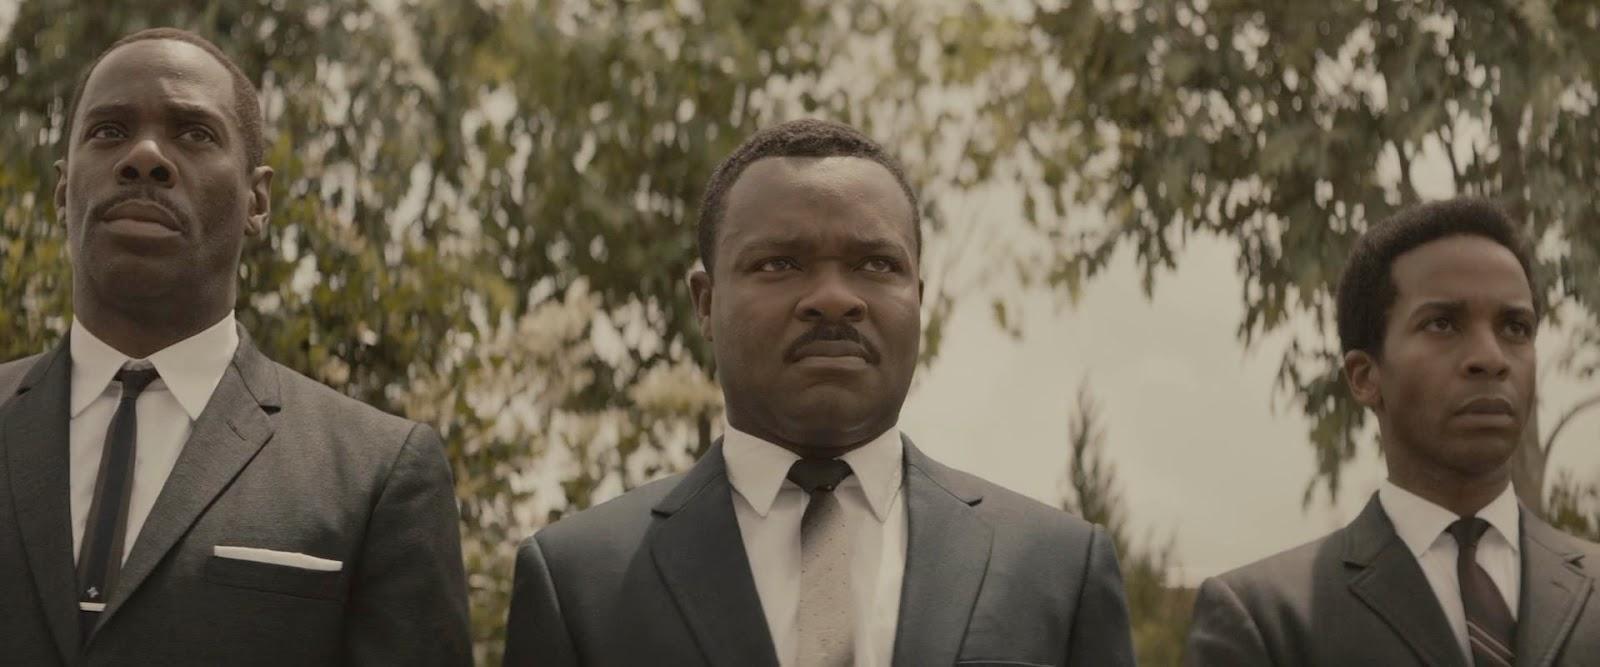 Selma (2014) S2 s Selma (2014)